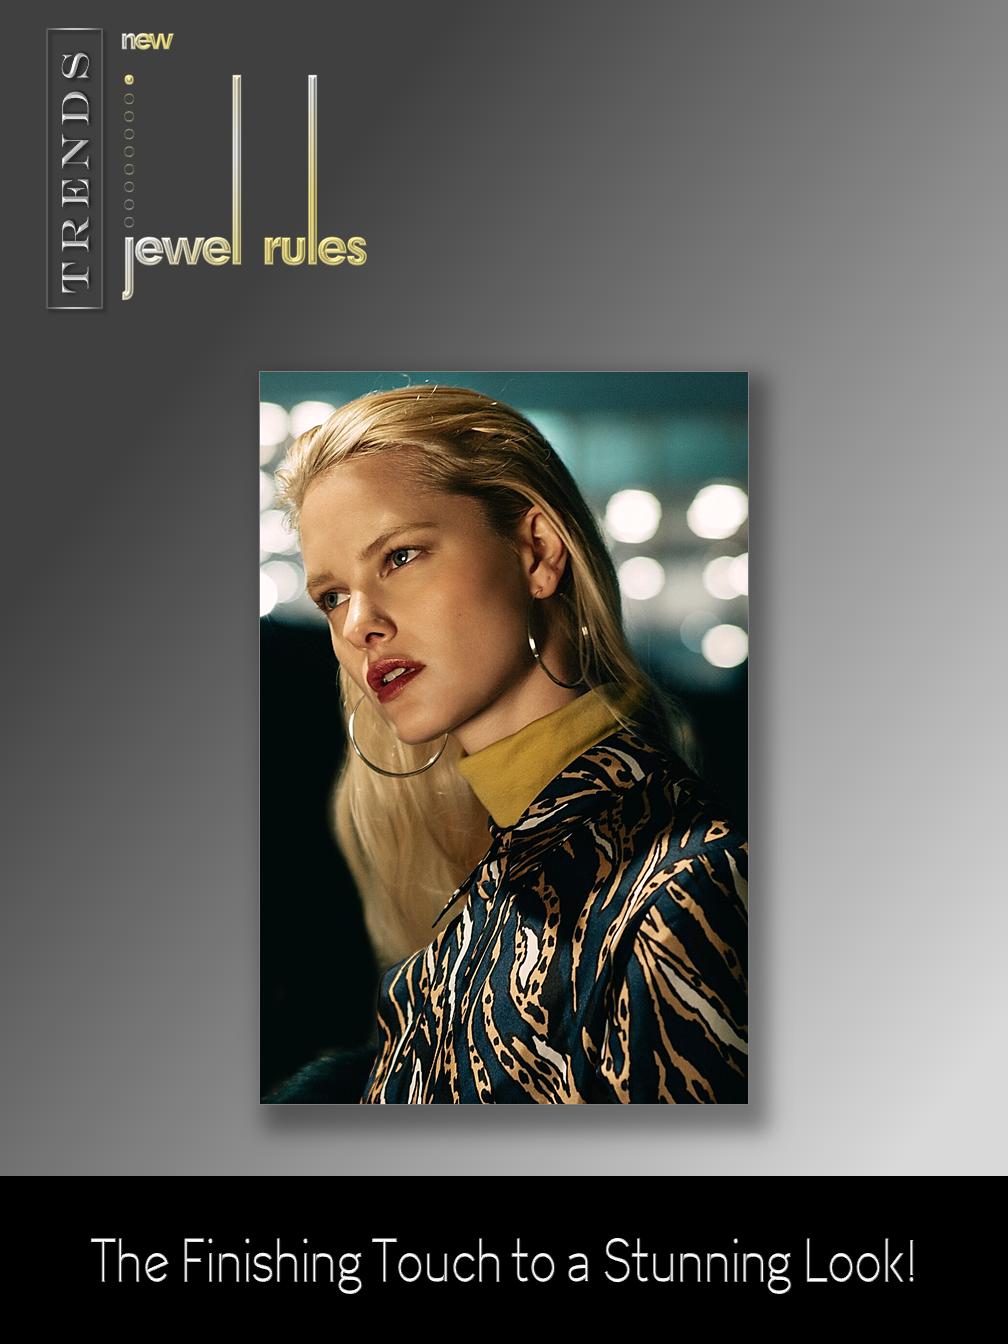 New Jewel Rules